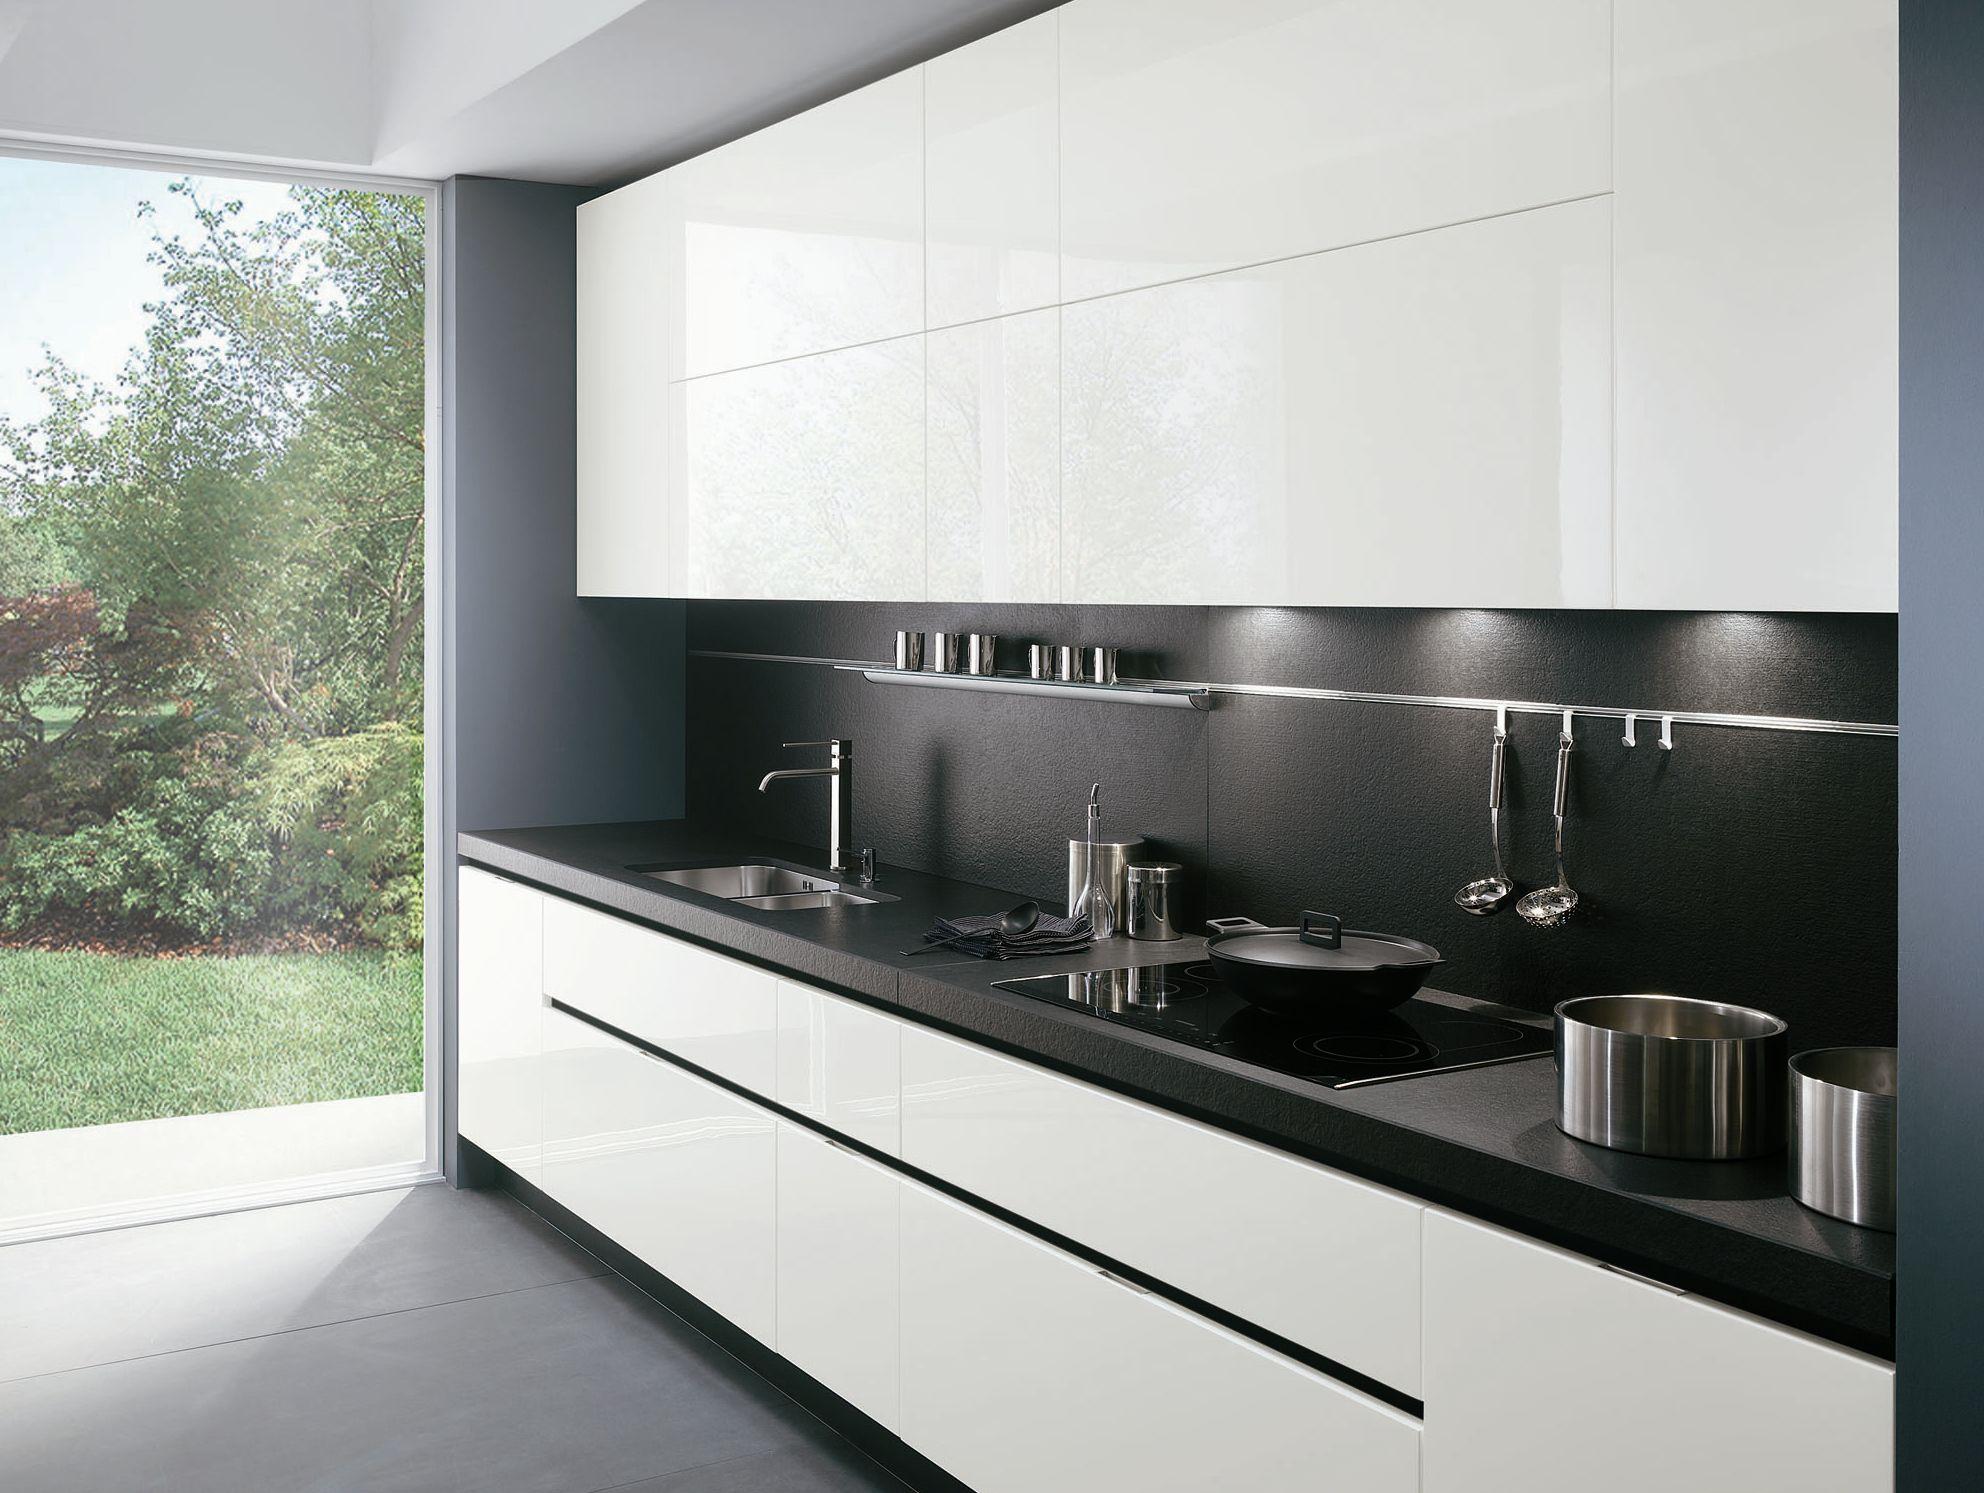 Elektra lacquered kitchen by ernestomeda design pietro arosio